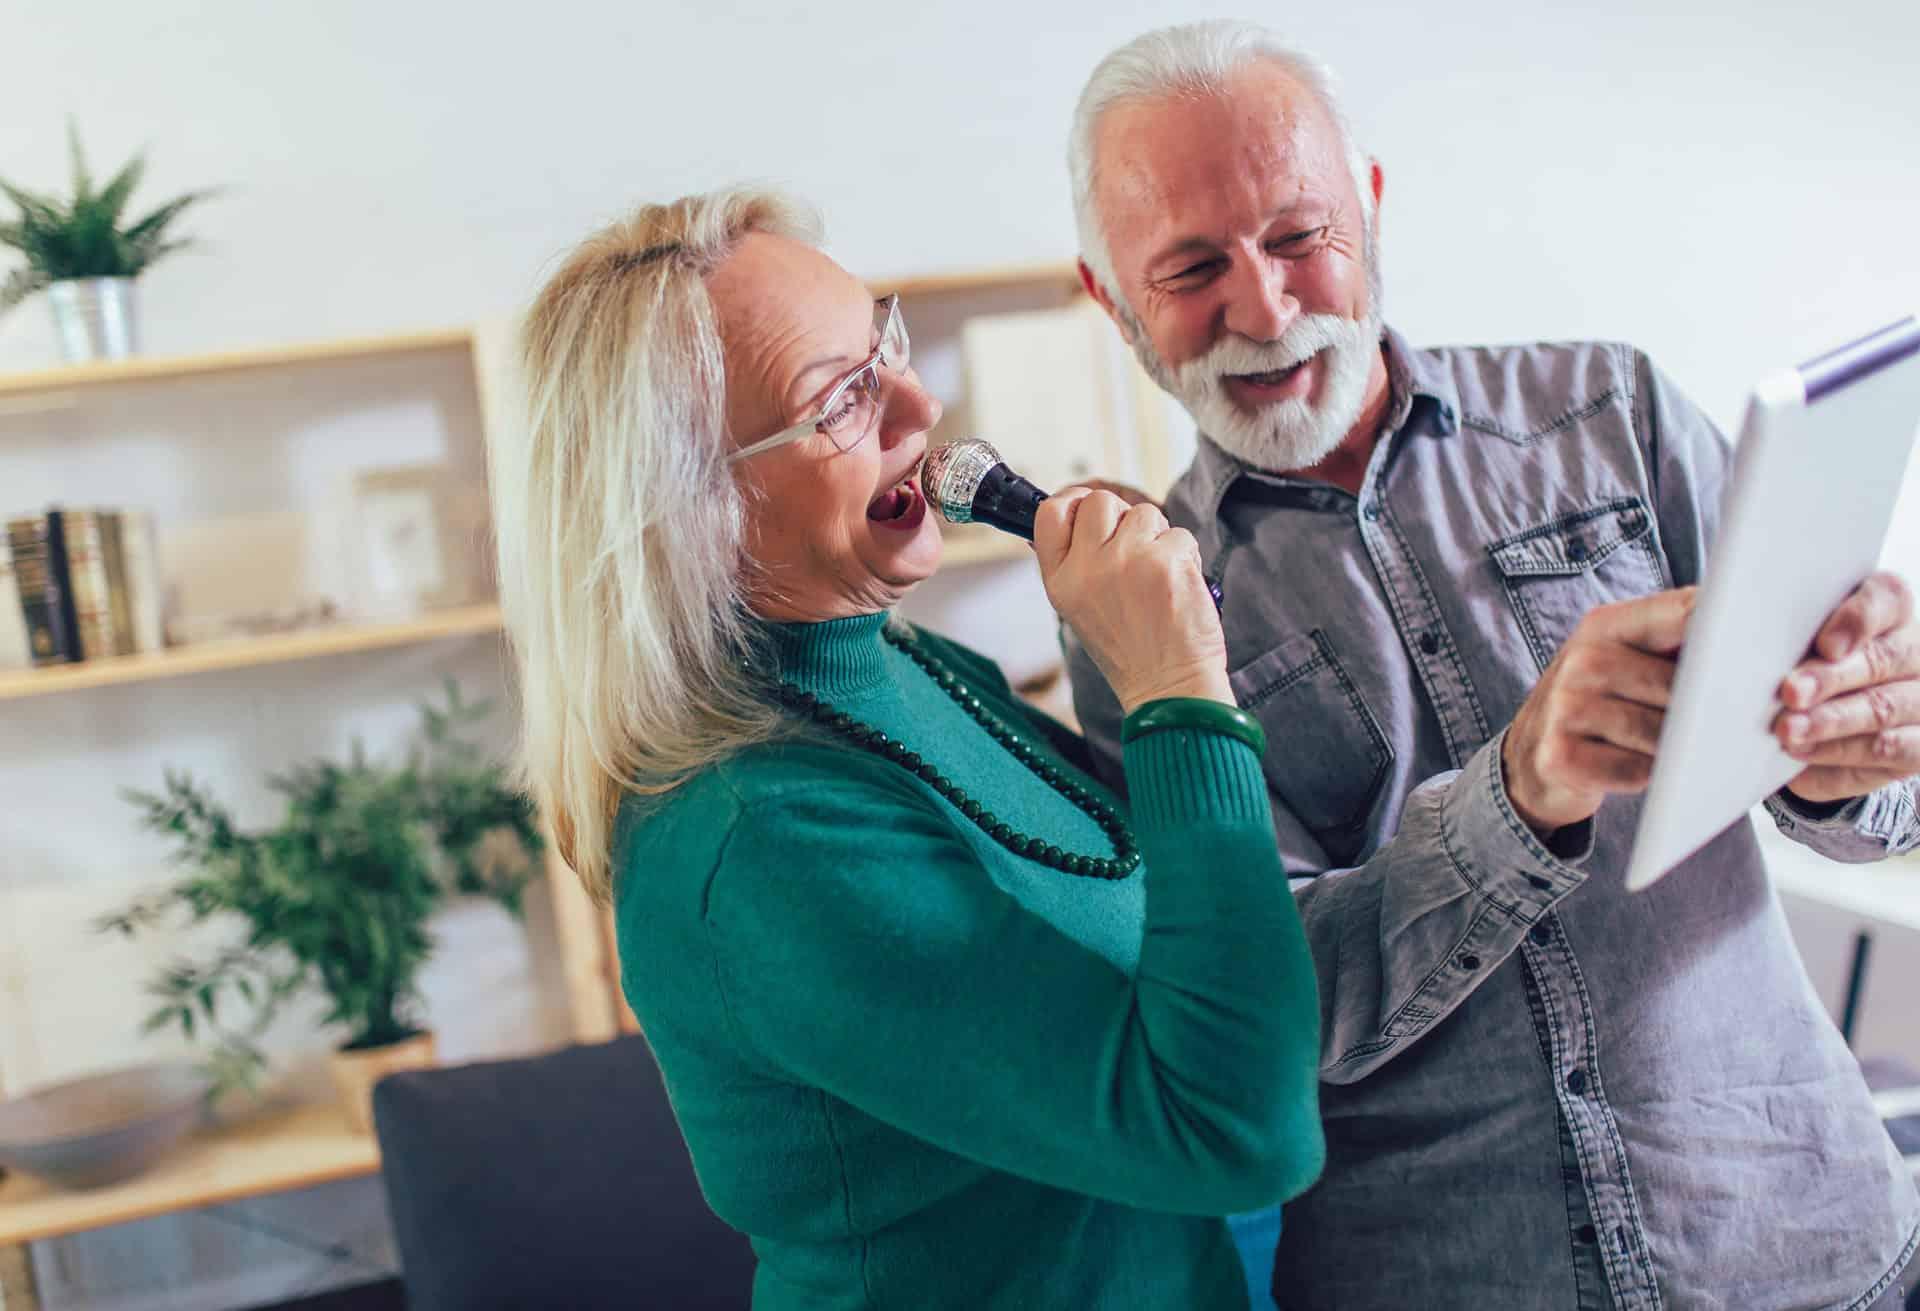 Senior couple having a good time singing karaoke together